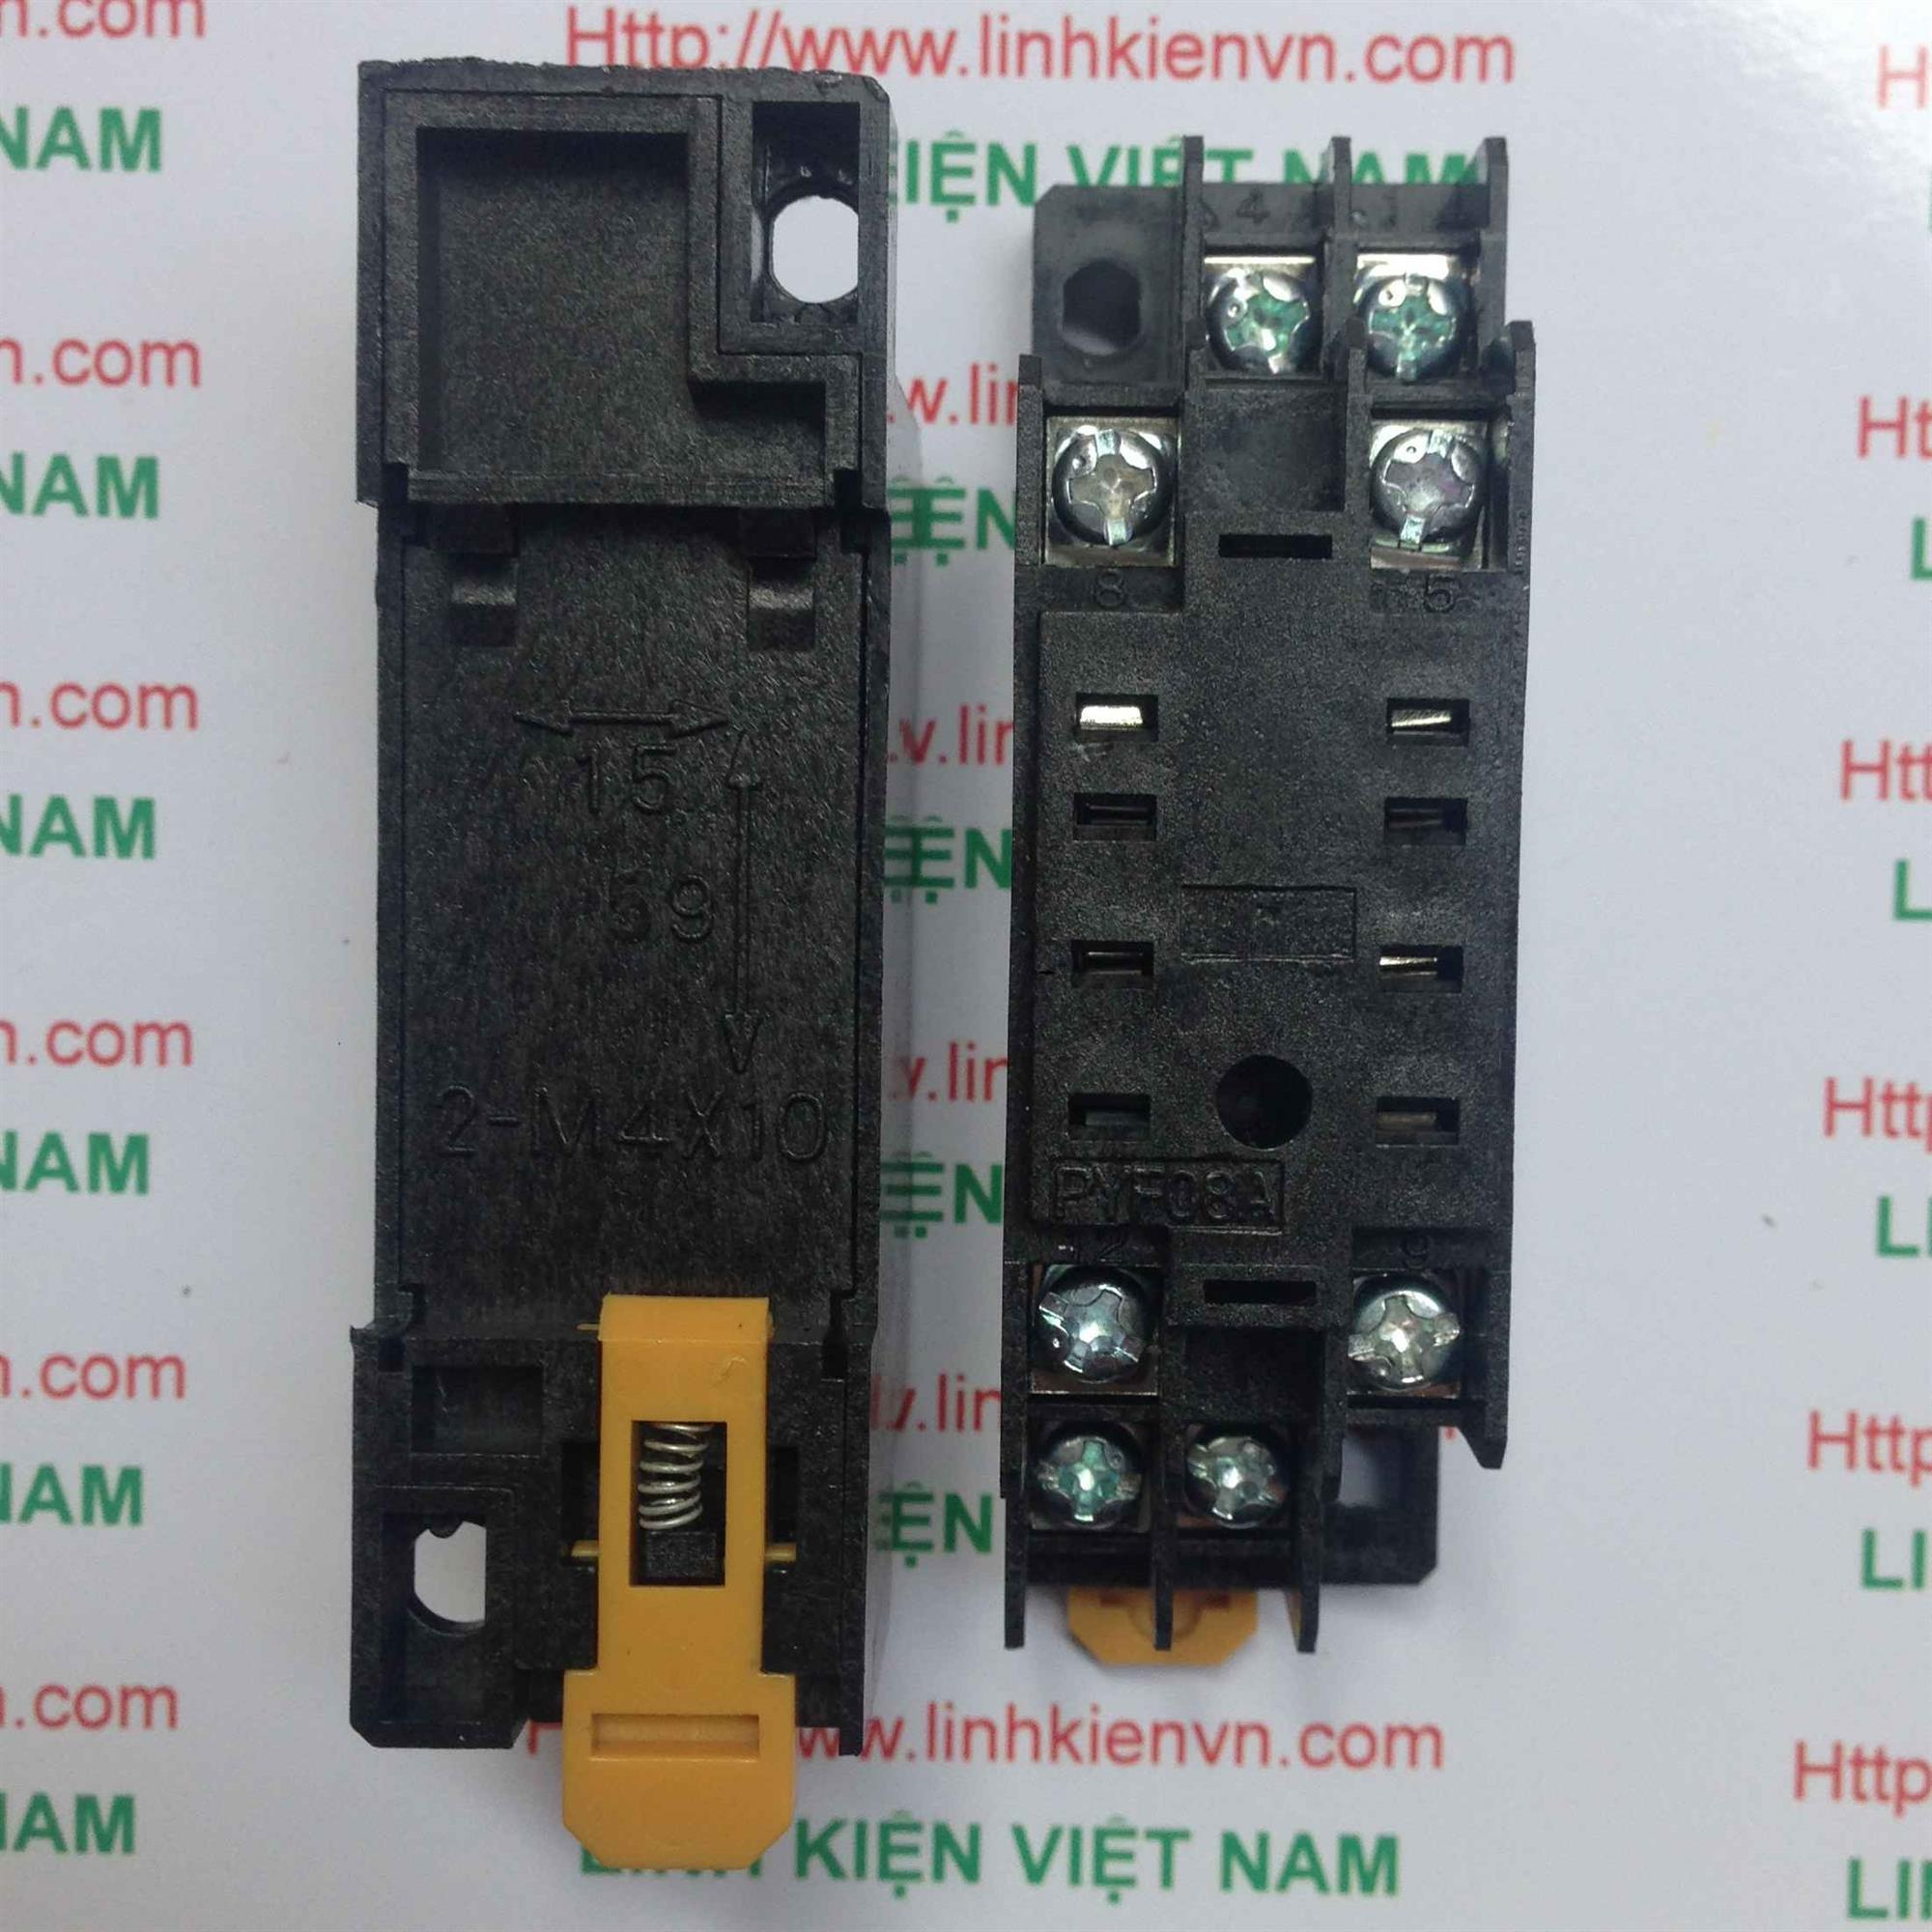 Socket Relay PYF08A - Đế Relay 8 chân - A1H20